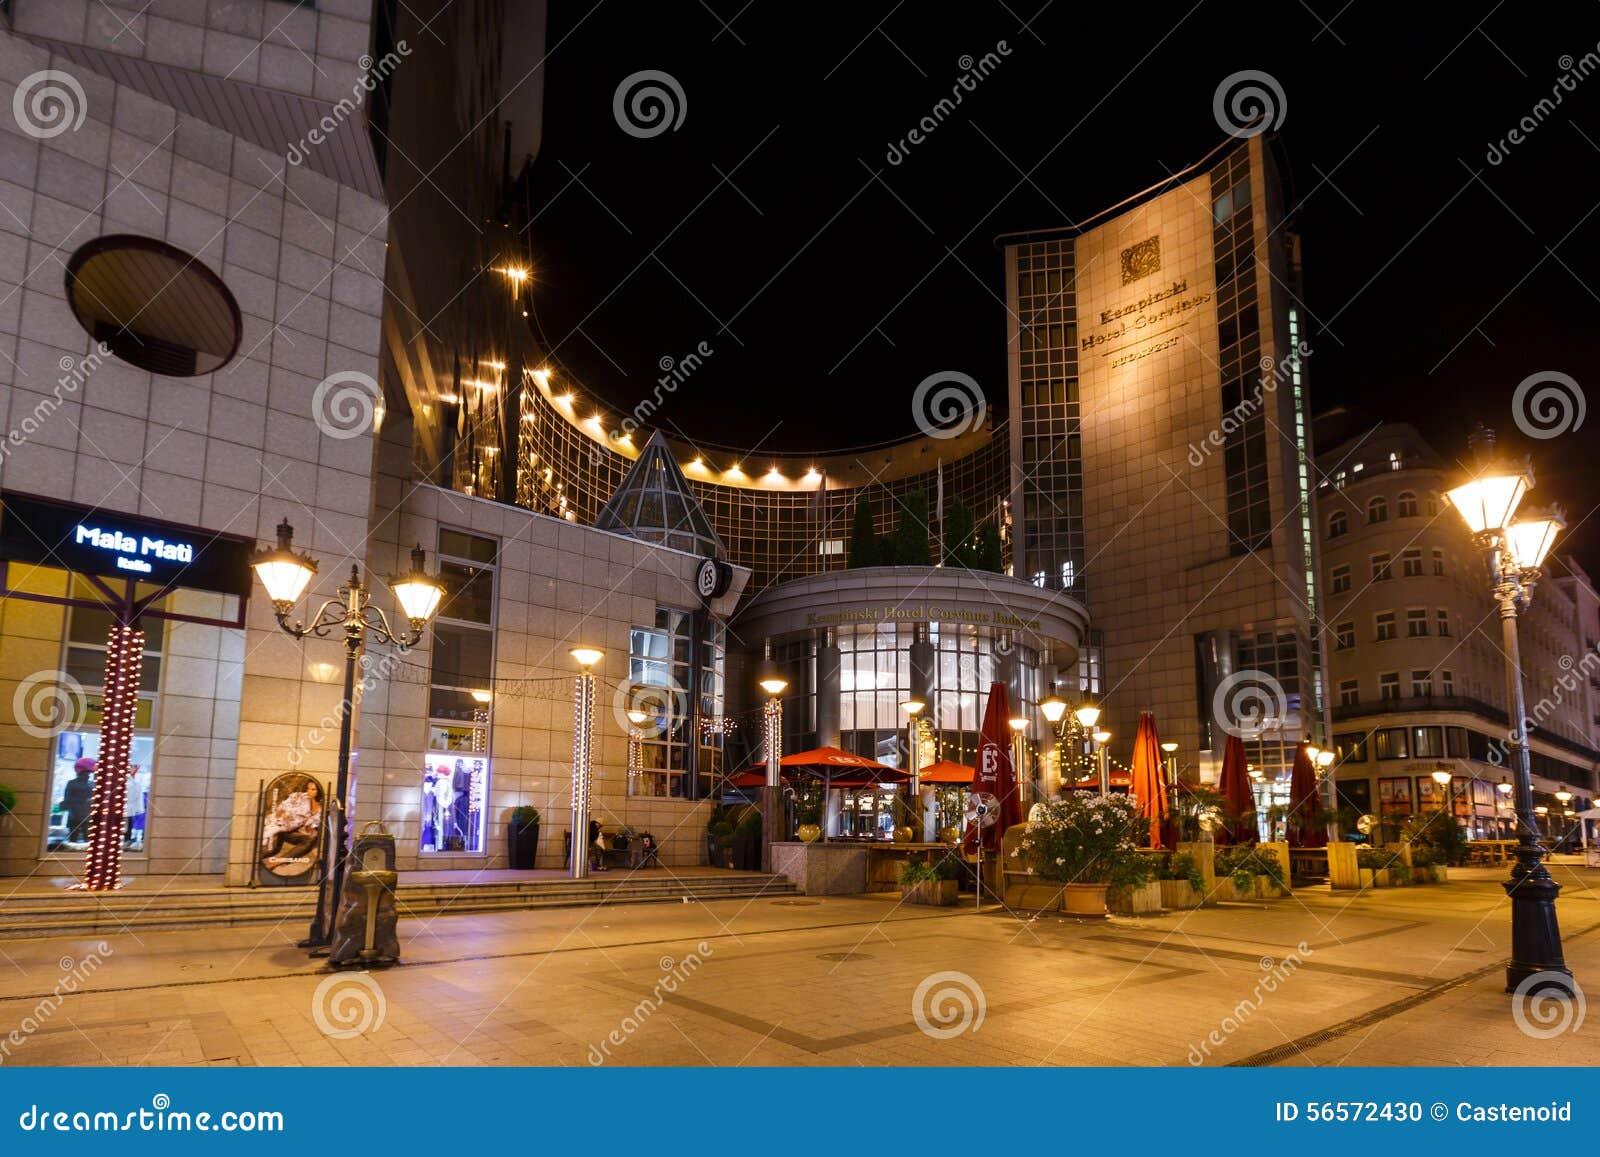 Download Ξενοδοχείο Corvinus Βουδαπέστη Kempinsky Εκδοτική εικόνα - εικόνα από μεγάλος, λαμπτήρας: 56572430